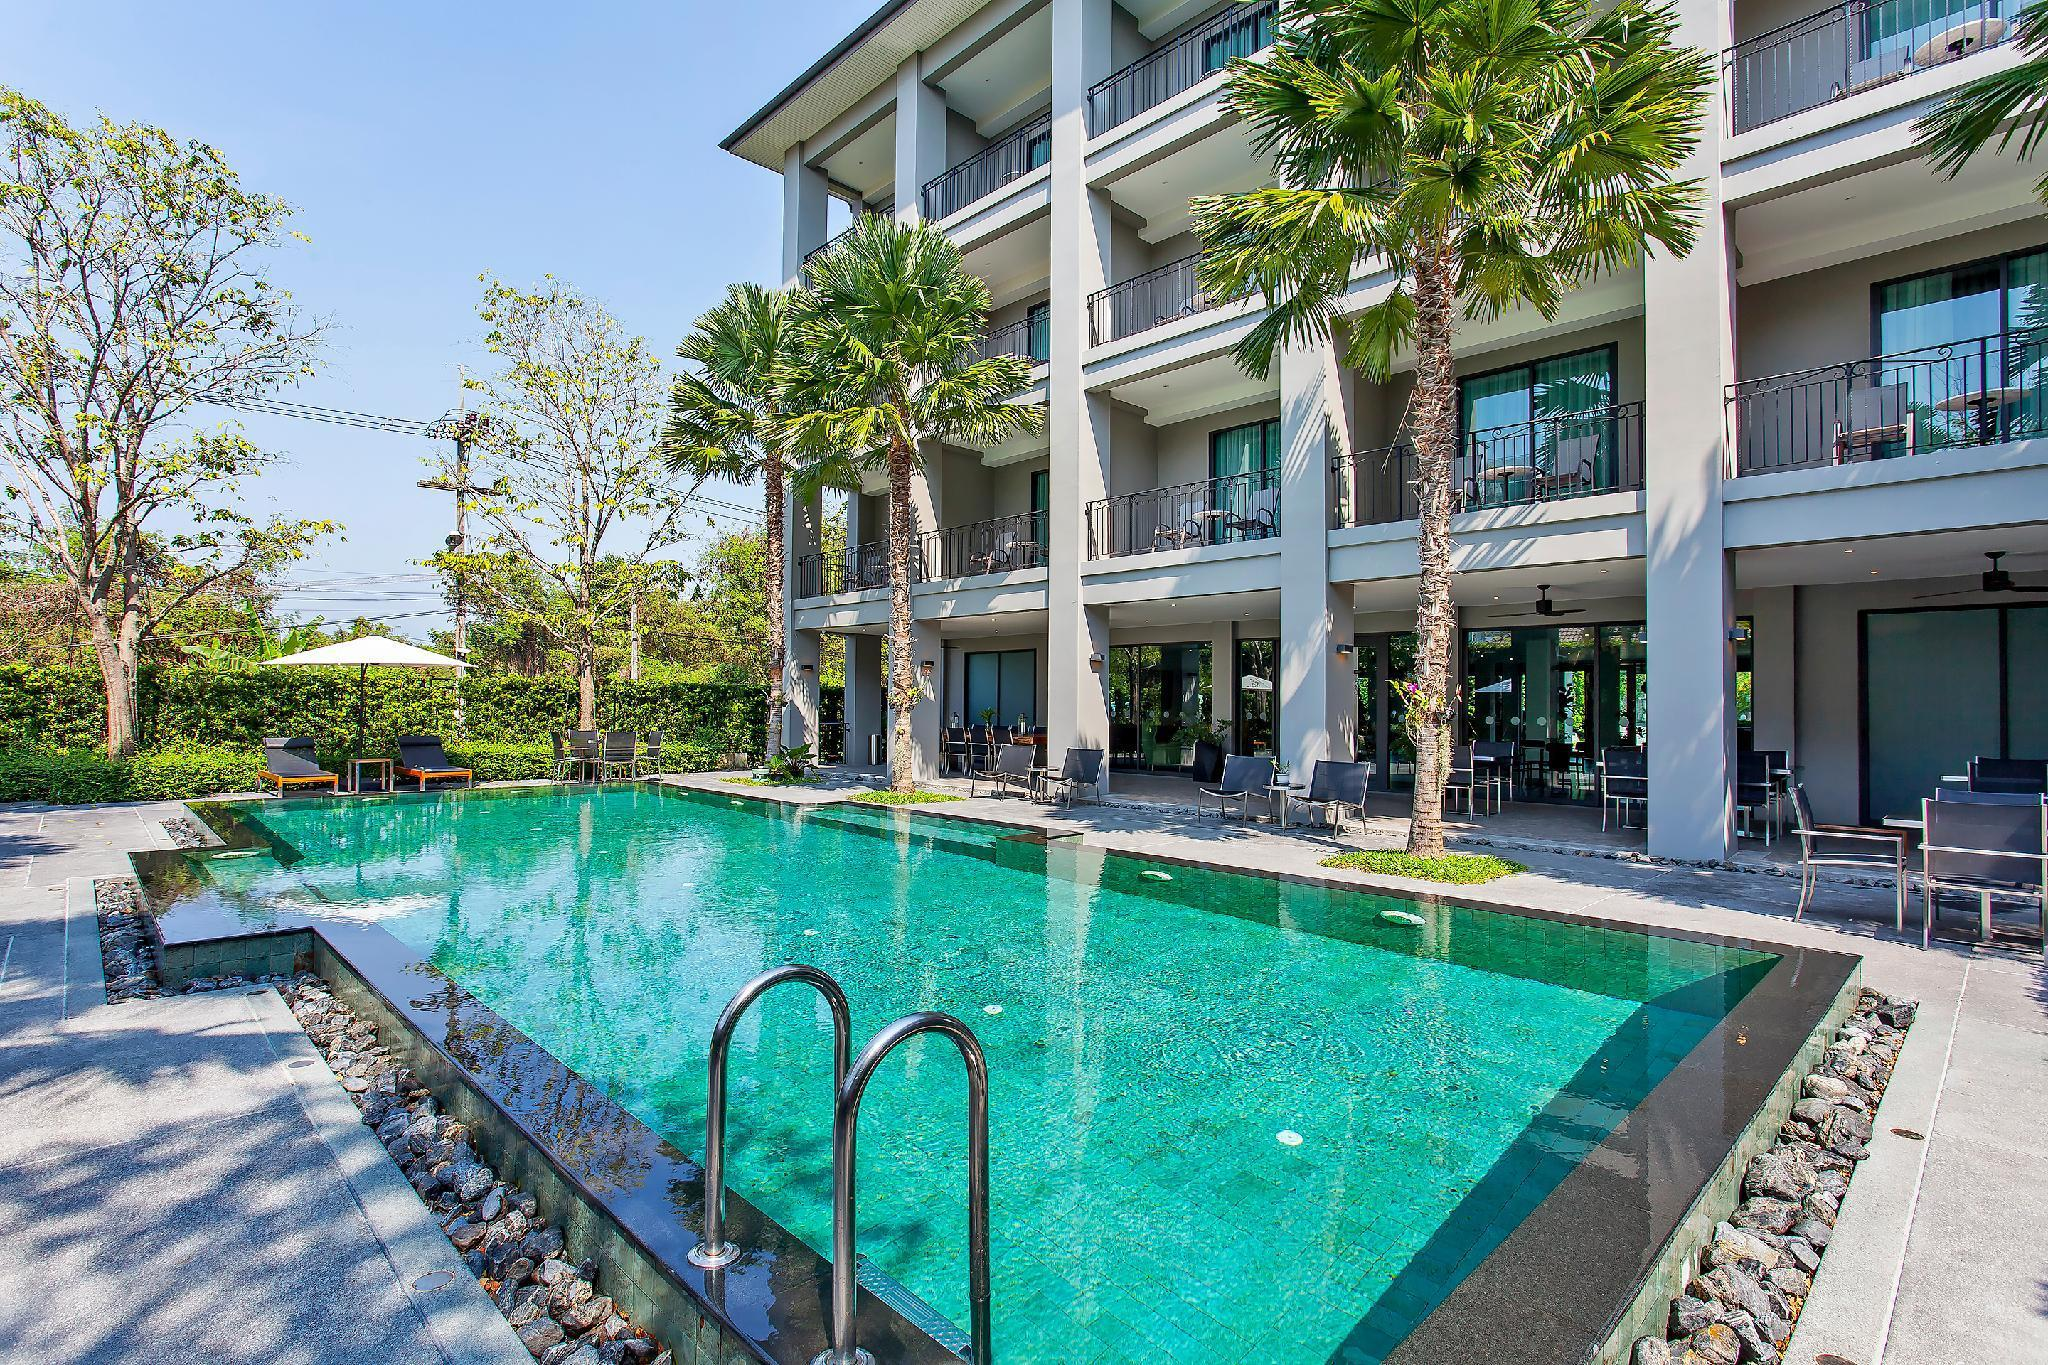 Palm Springs Resort 20BR with Pool 1km to Beach วิลลา 20 ห้องนอน 20 ห้องน้ำส่วนตัว ขนาด 1500 ตร.ม. – หาดจอมเทียน